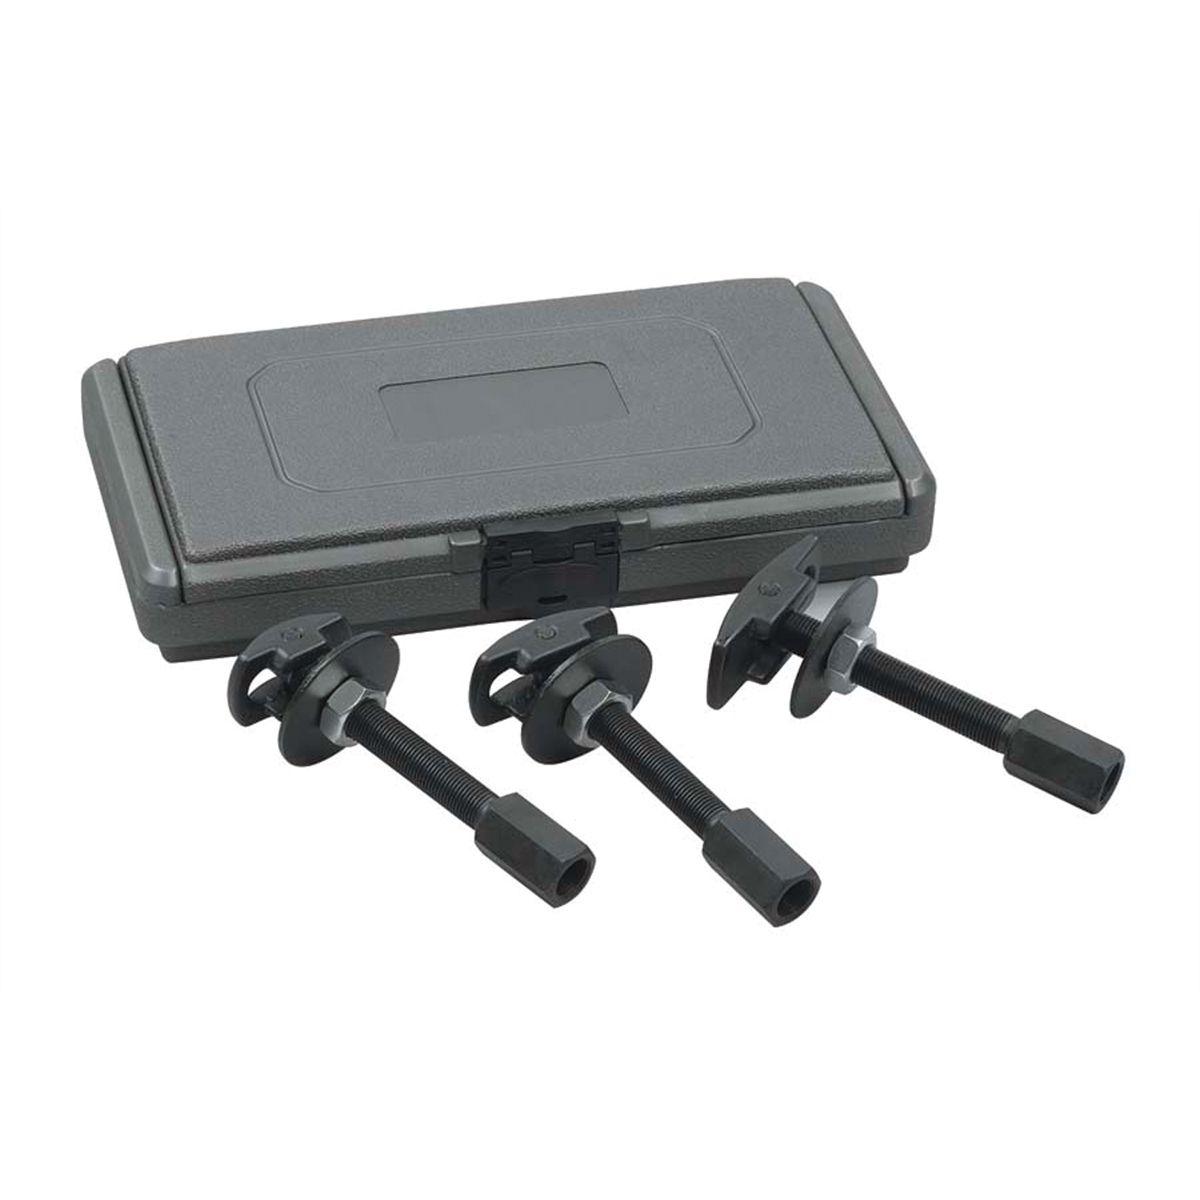 Kd Tools 41710 Rear Axle Bearing Puller Set Kdt41710